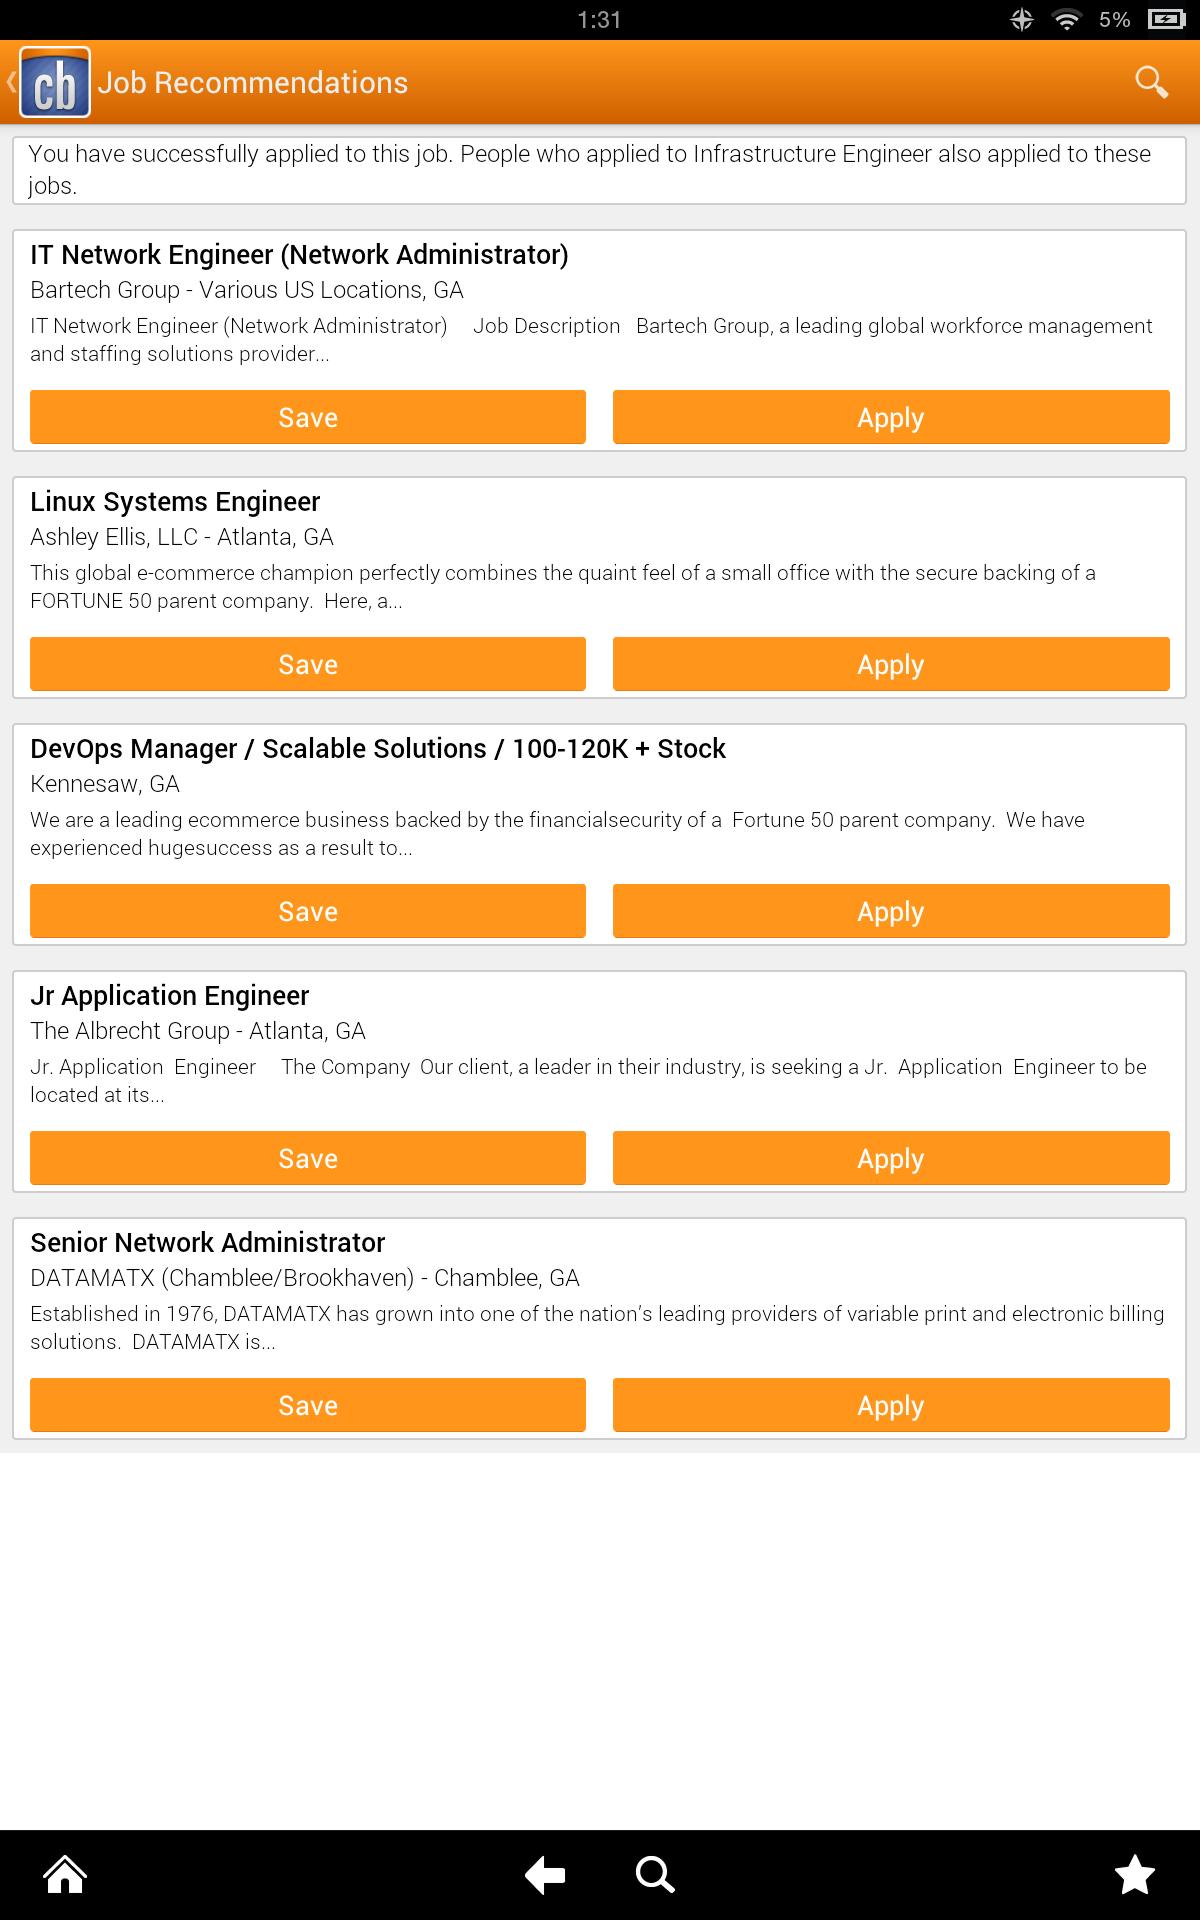 Awesome System Application Engineer Job Description 1 Frieze ...